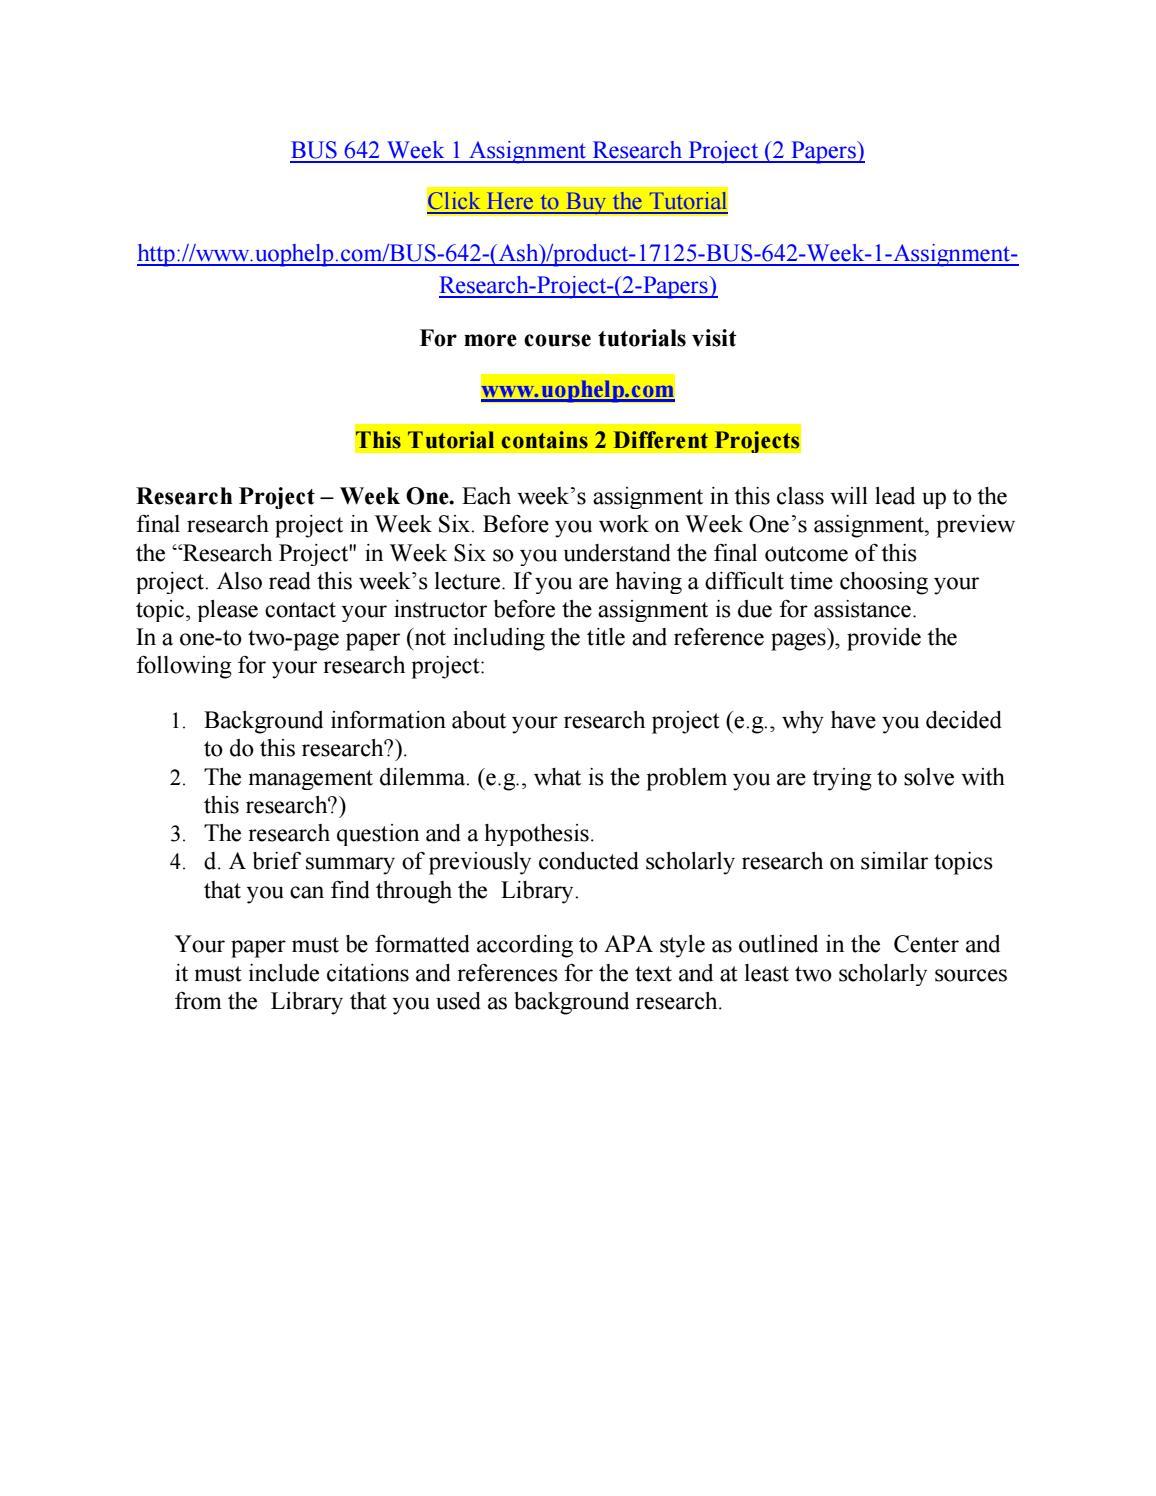 perfect holidays essay sample